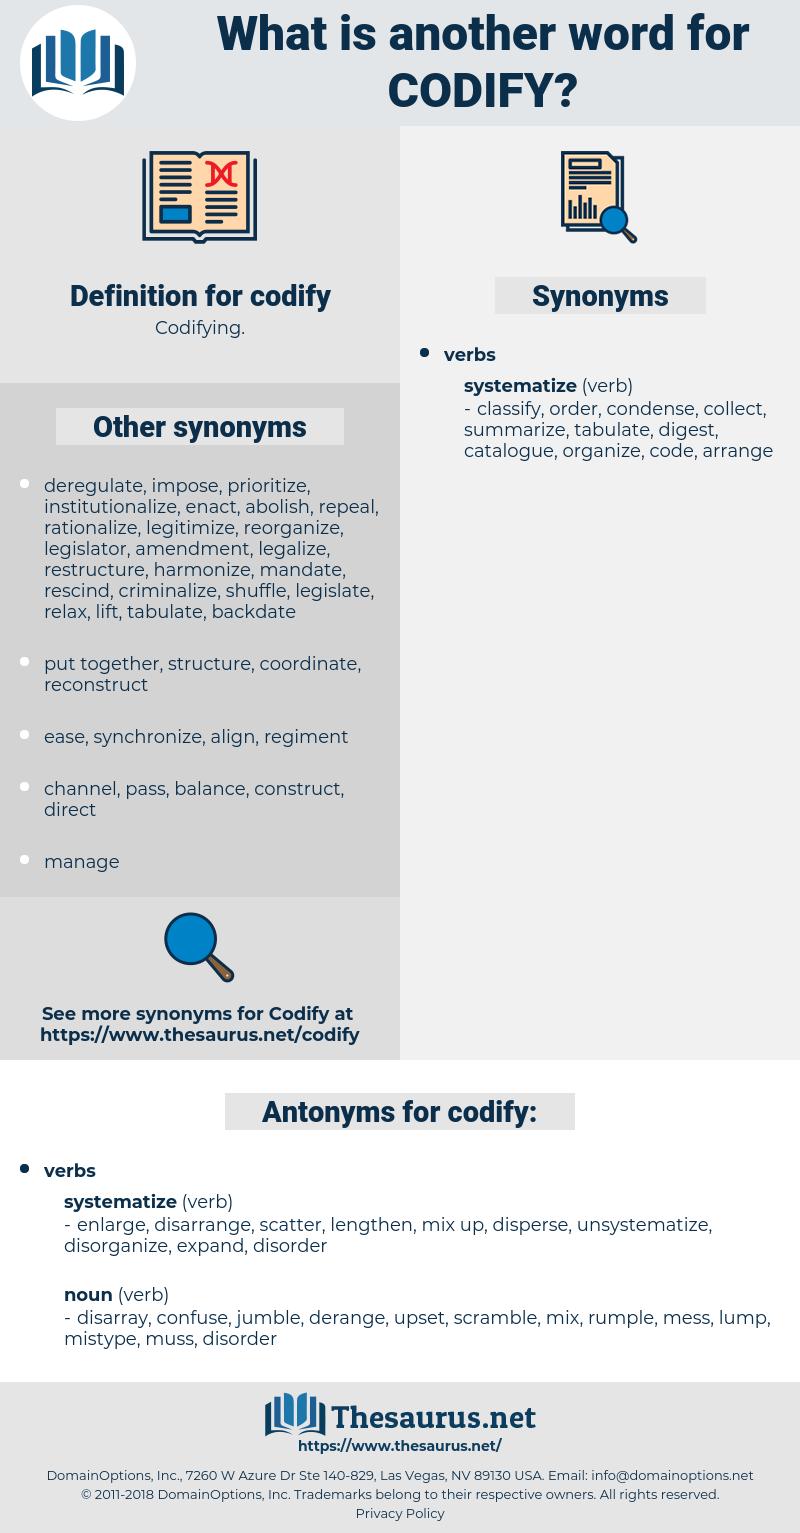 codify, synonym codify, another word for codify, words like codify, thesaurus codify